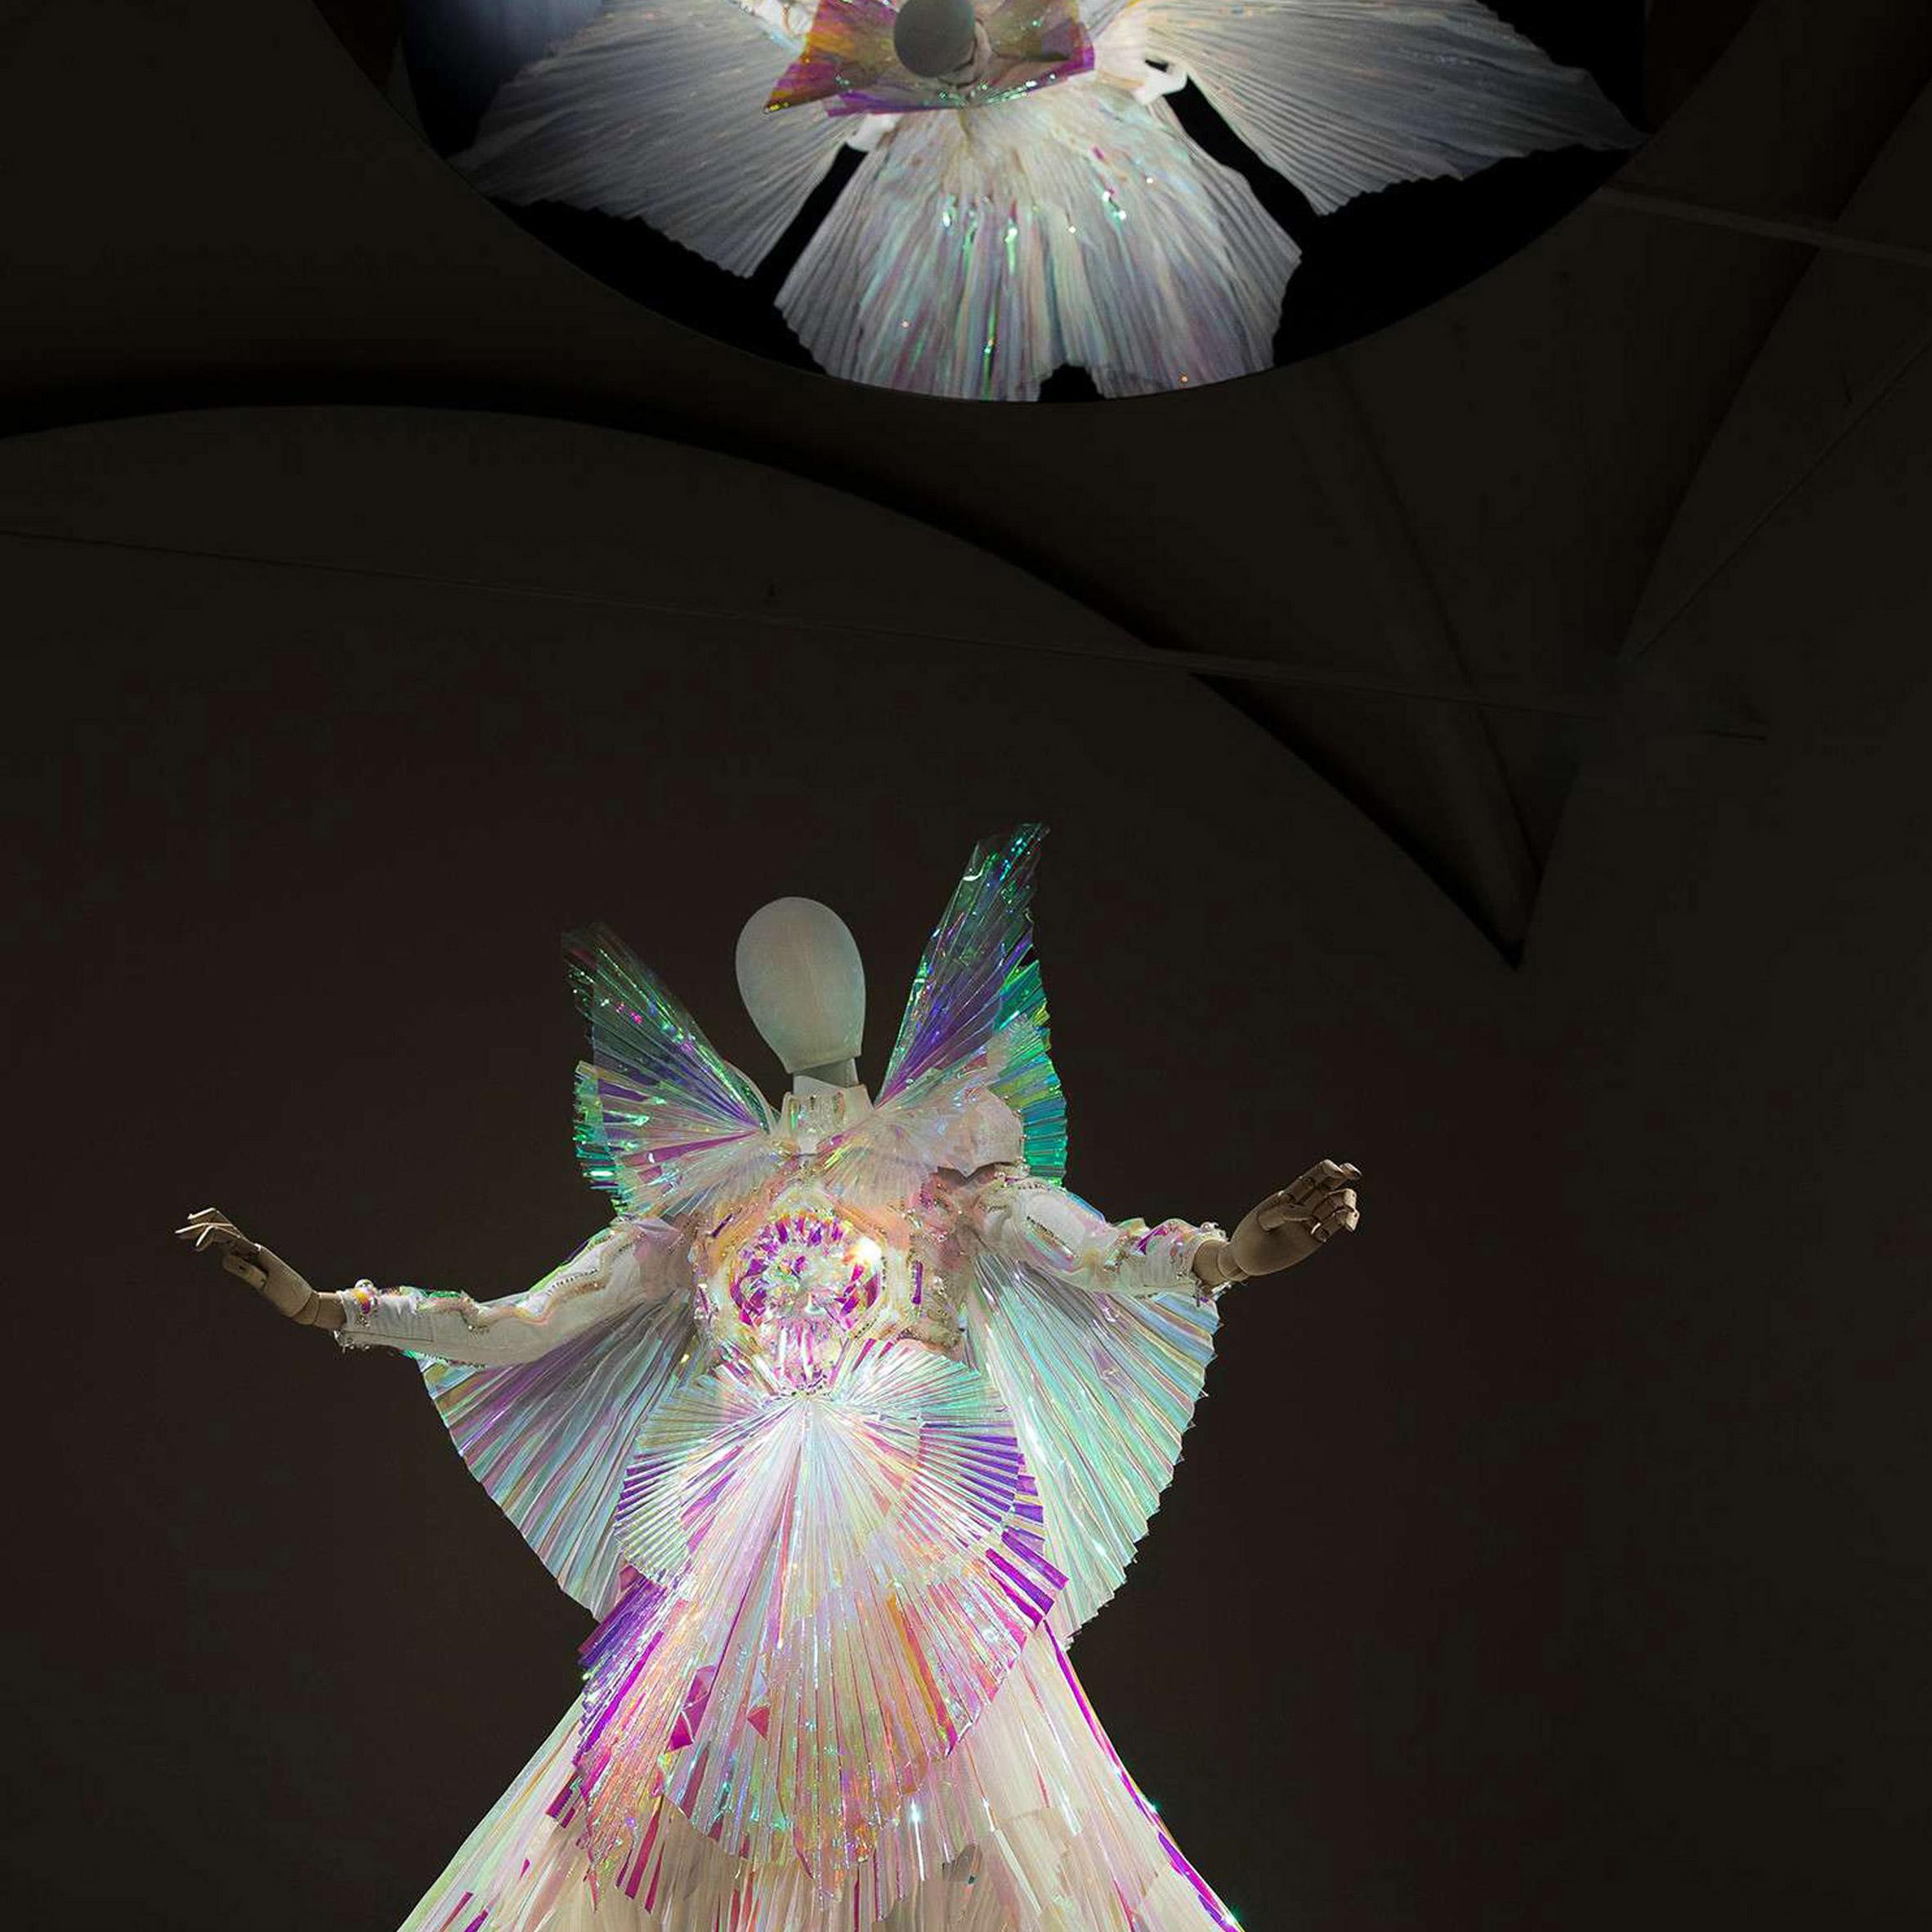 ec263bcec8fe8d Gucci Garden exhibition features Björk's dresses